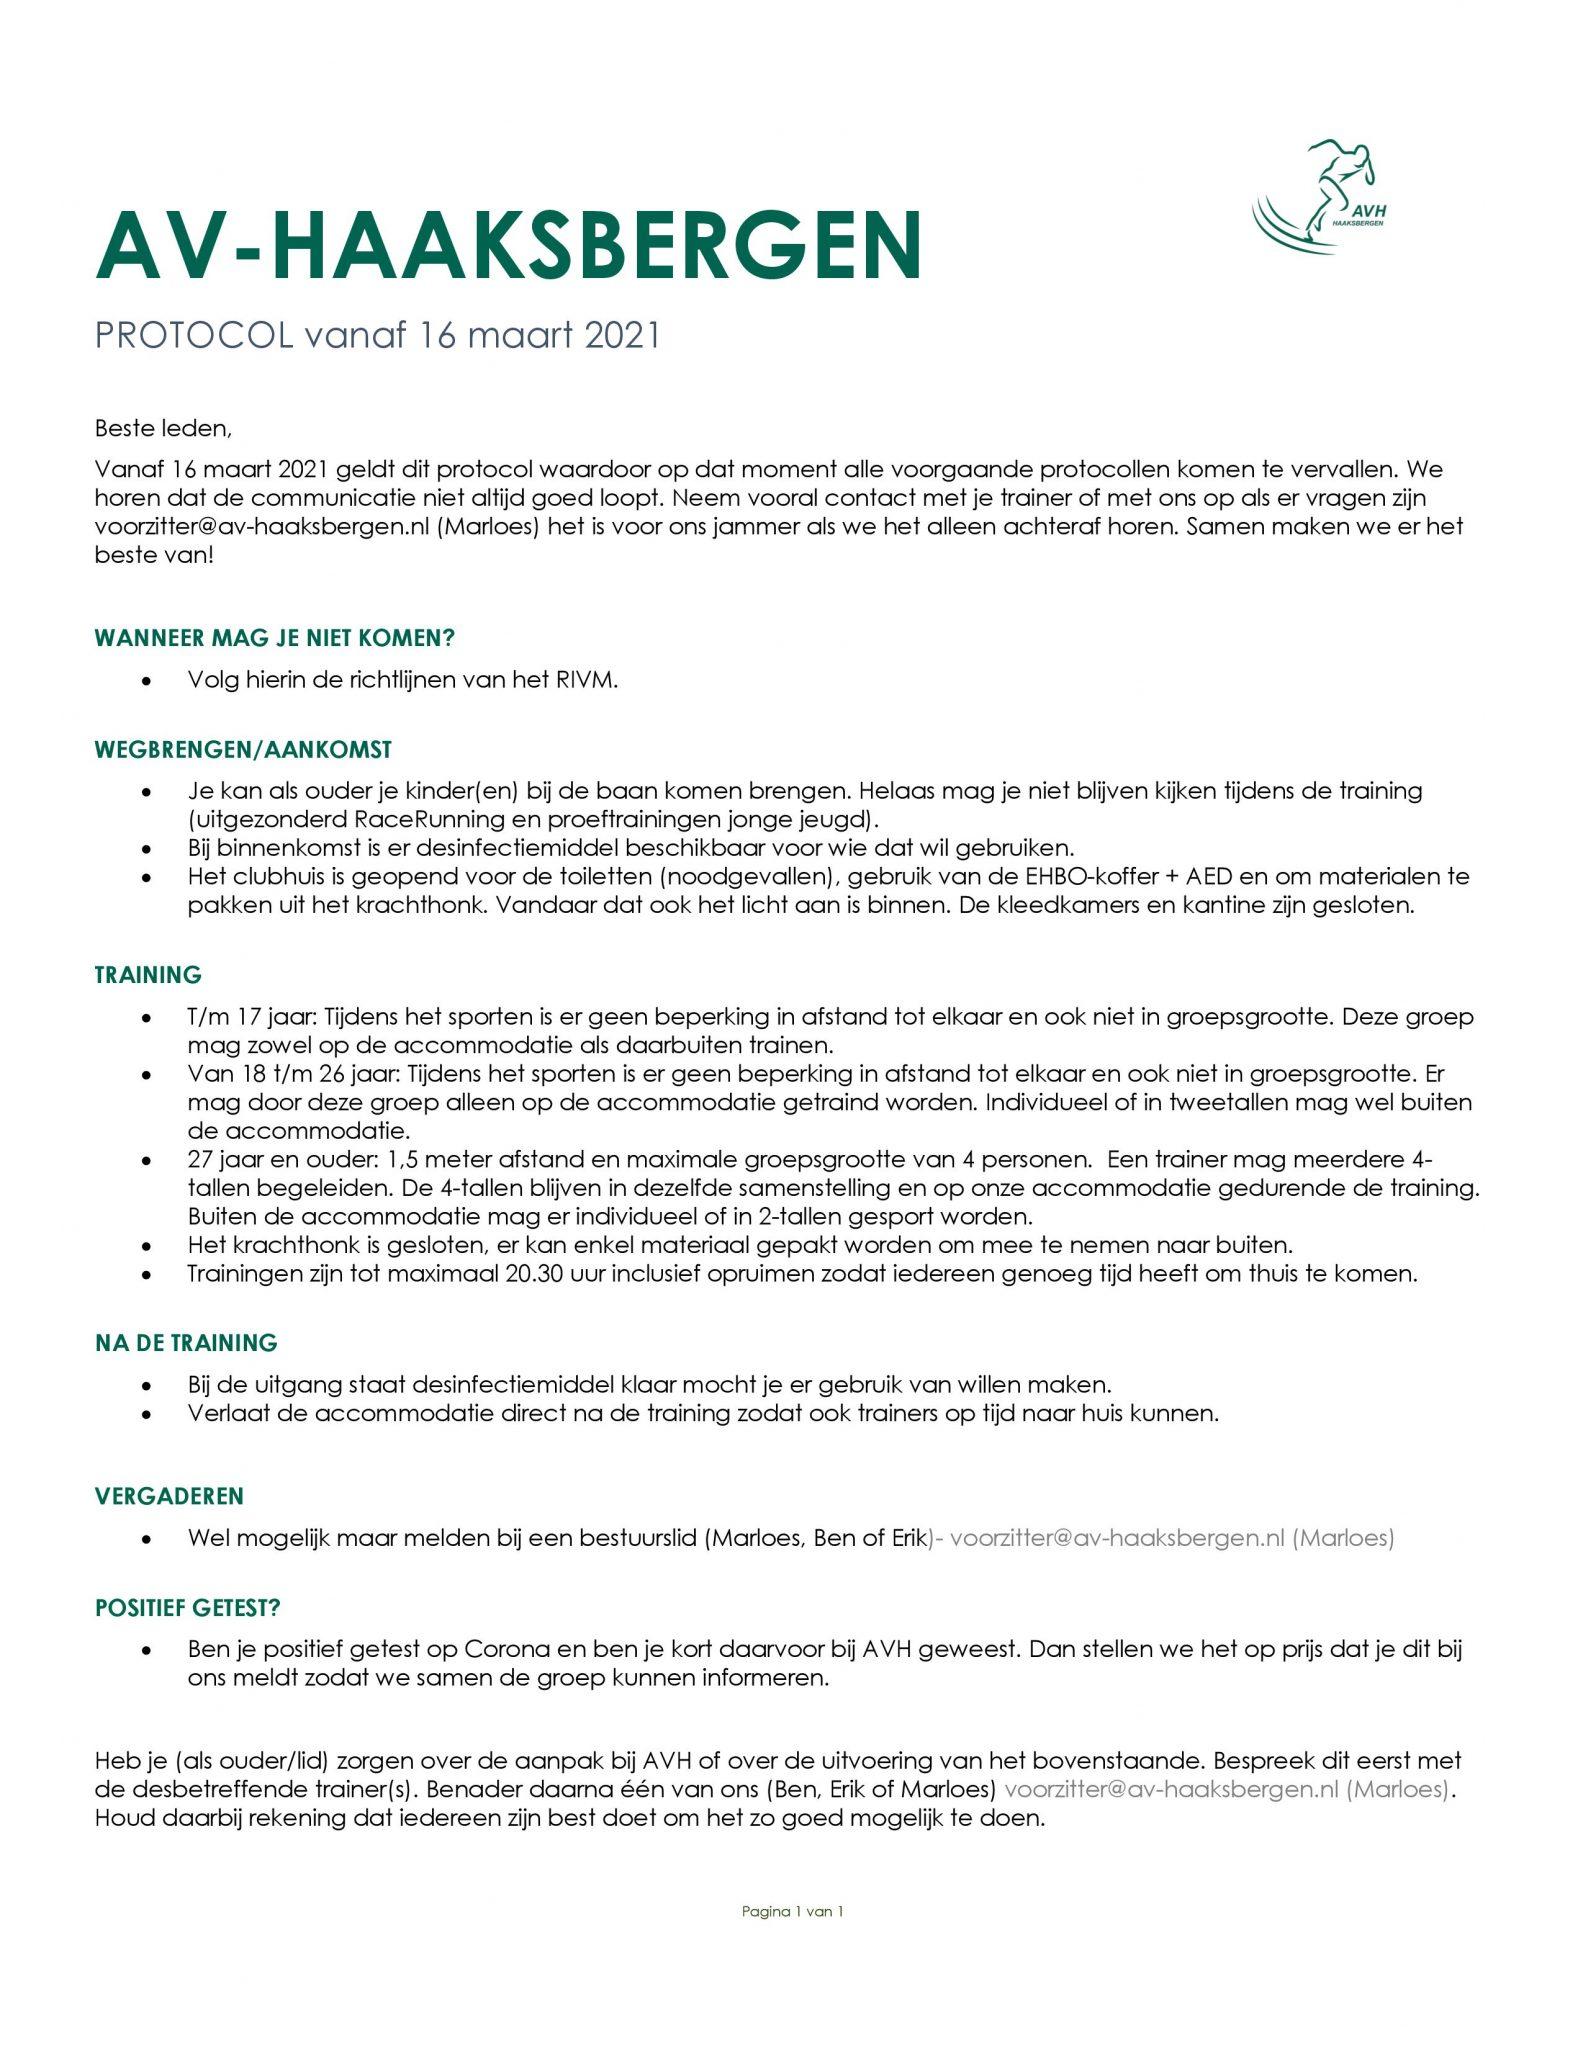 AVH Corona protocol per 16 maart 2021.